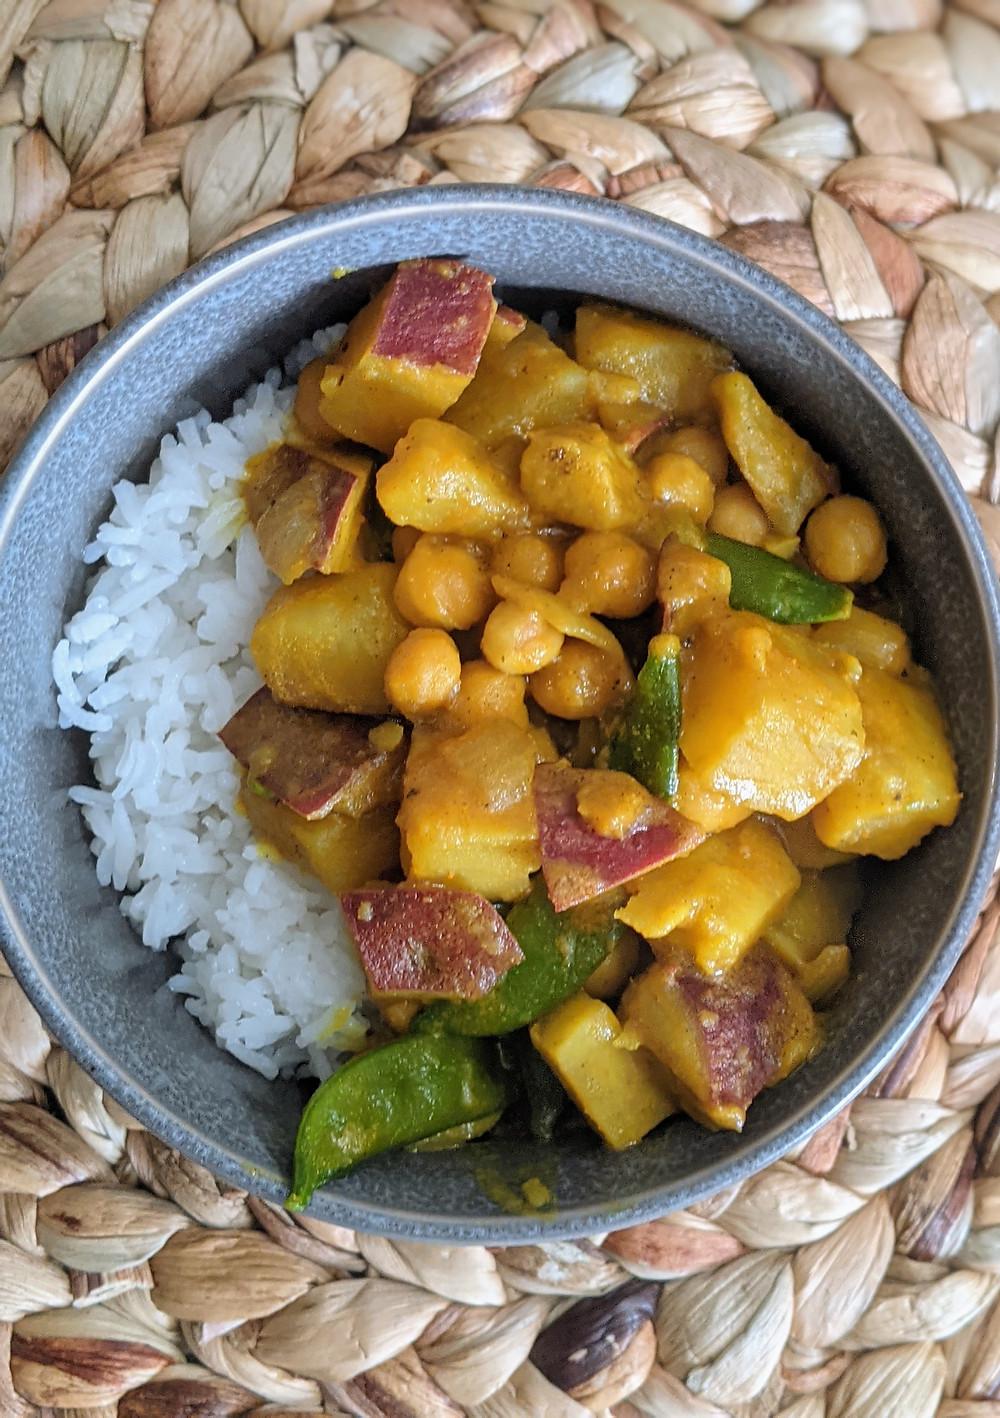 Peanut Butter Chickpea and Sweet Potato Curry - amanda macgregor - joseph centineo - food allergy recipes